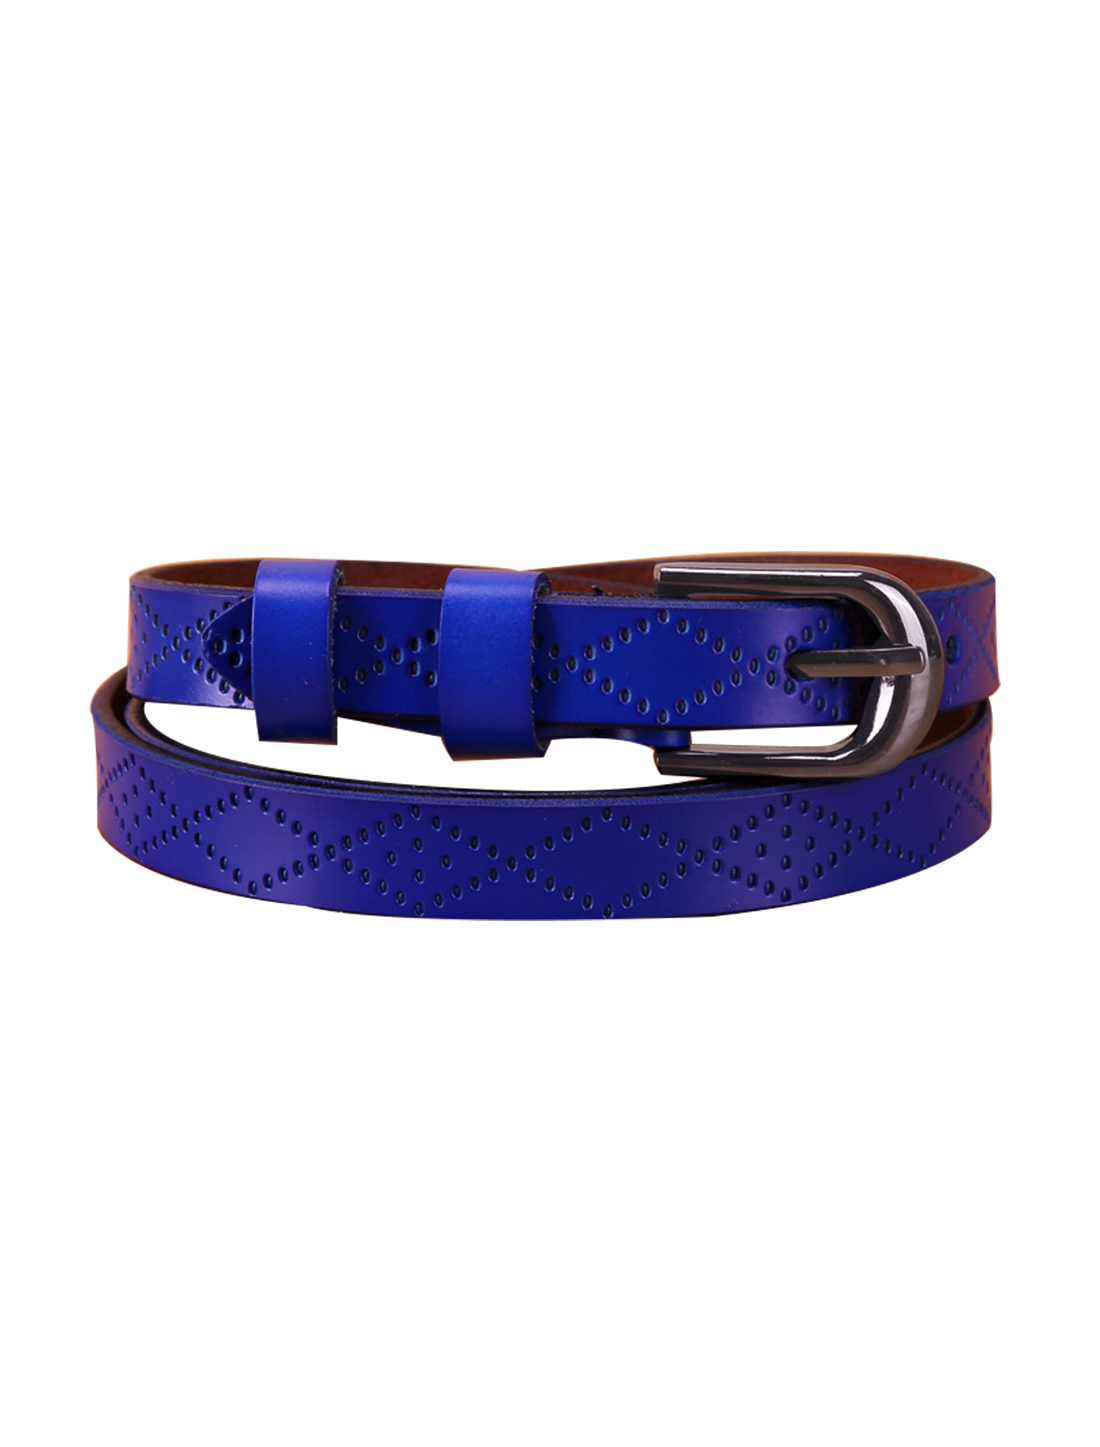 Women Exotic Embossed Diamond Pattern Single Pin Buckle Slender Waist Belt Blue